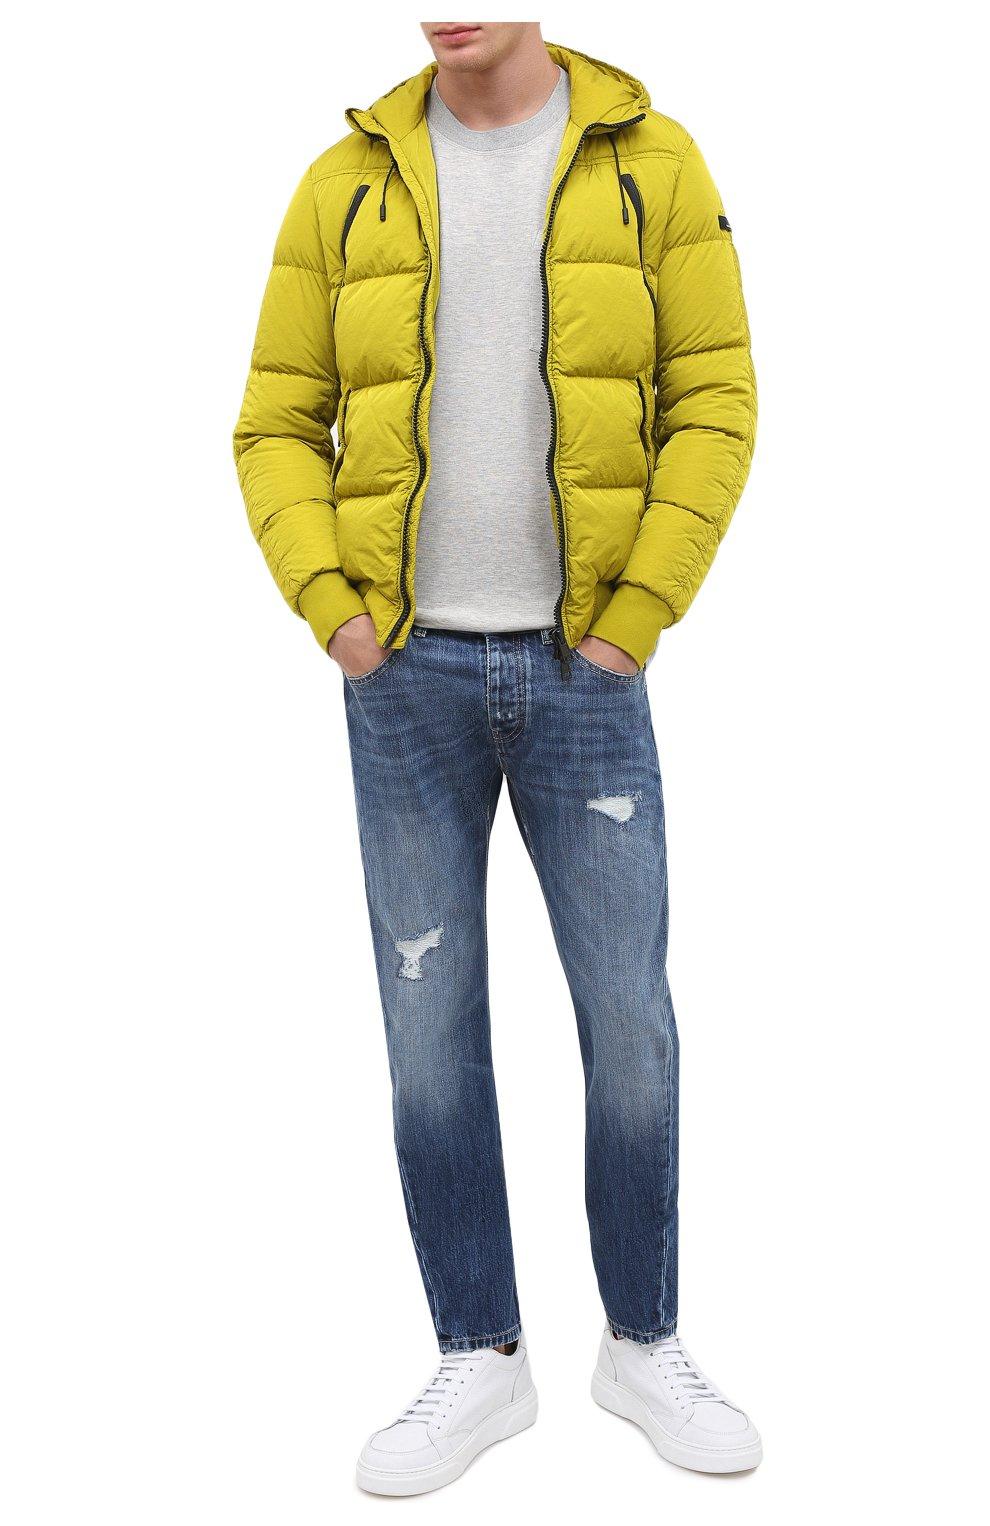 Мужские джинсы PREMIUM MOOD DENIM SUPERIOR синего цвета, арт. F21 352740215/BARRET | Фото 2